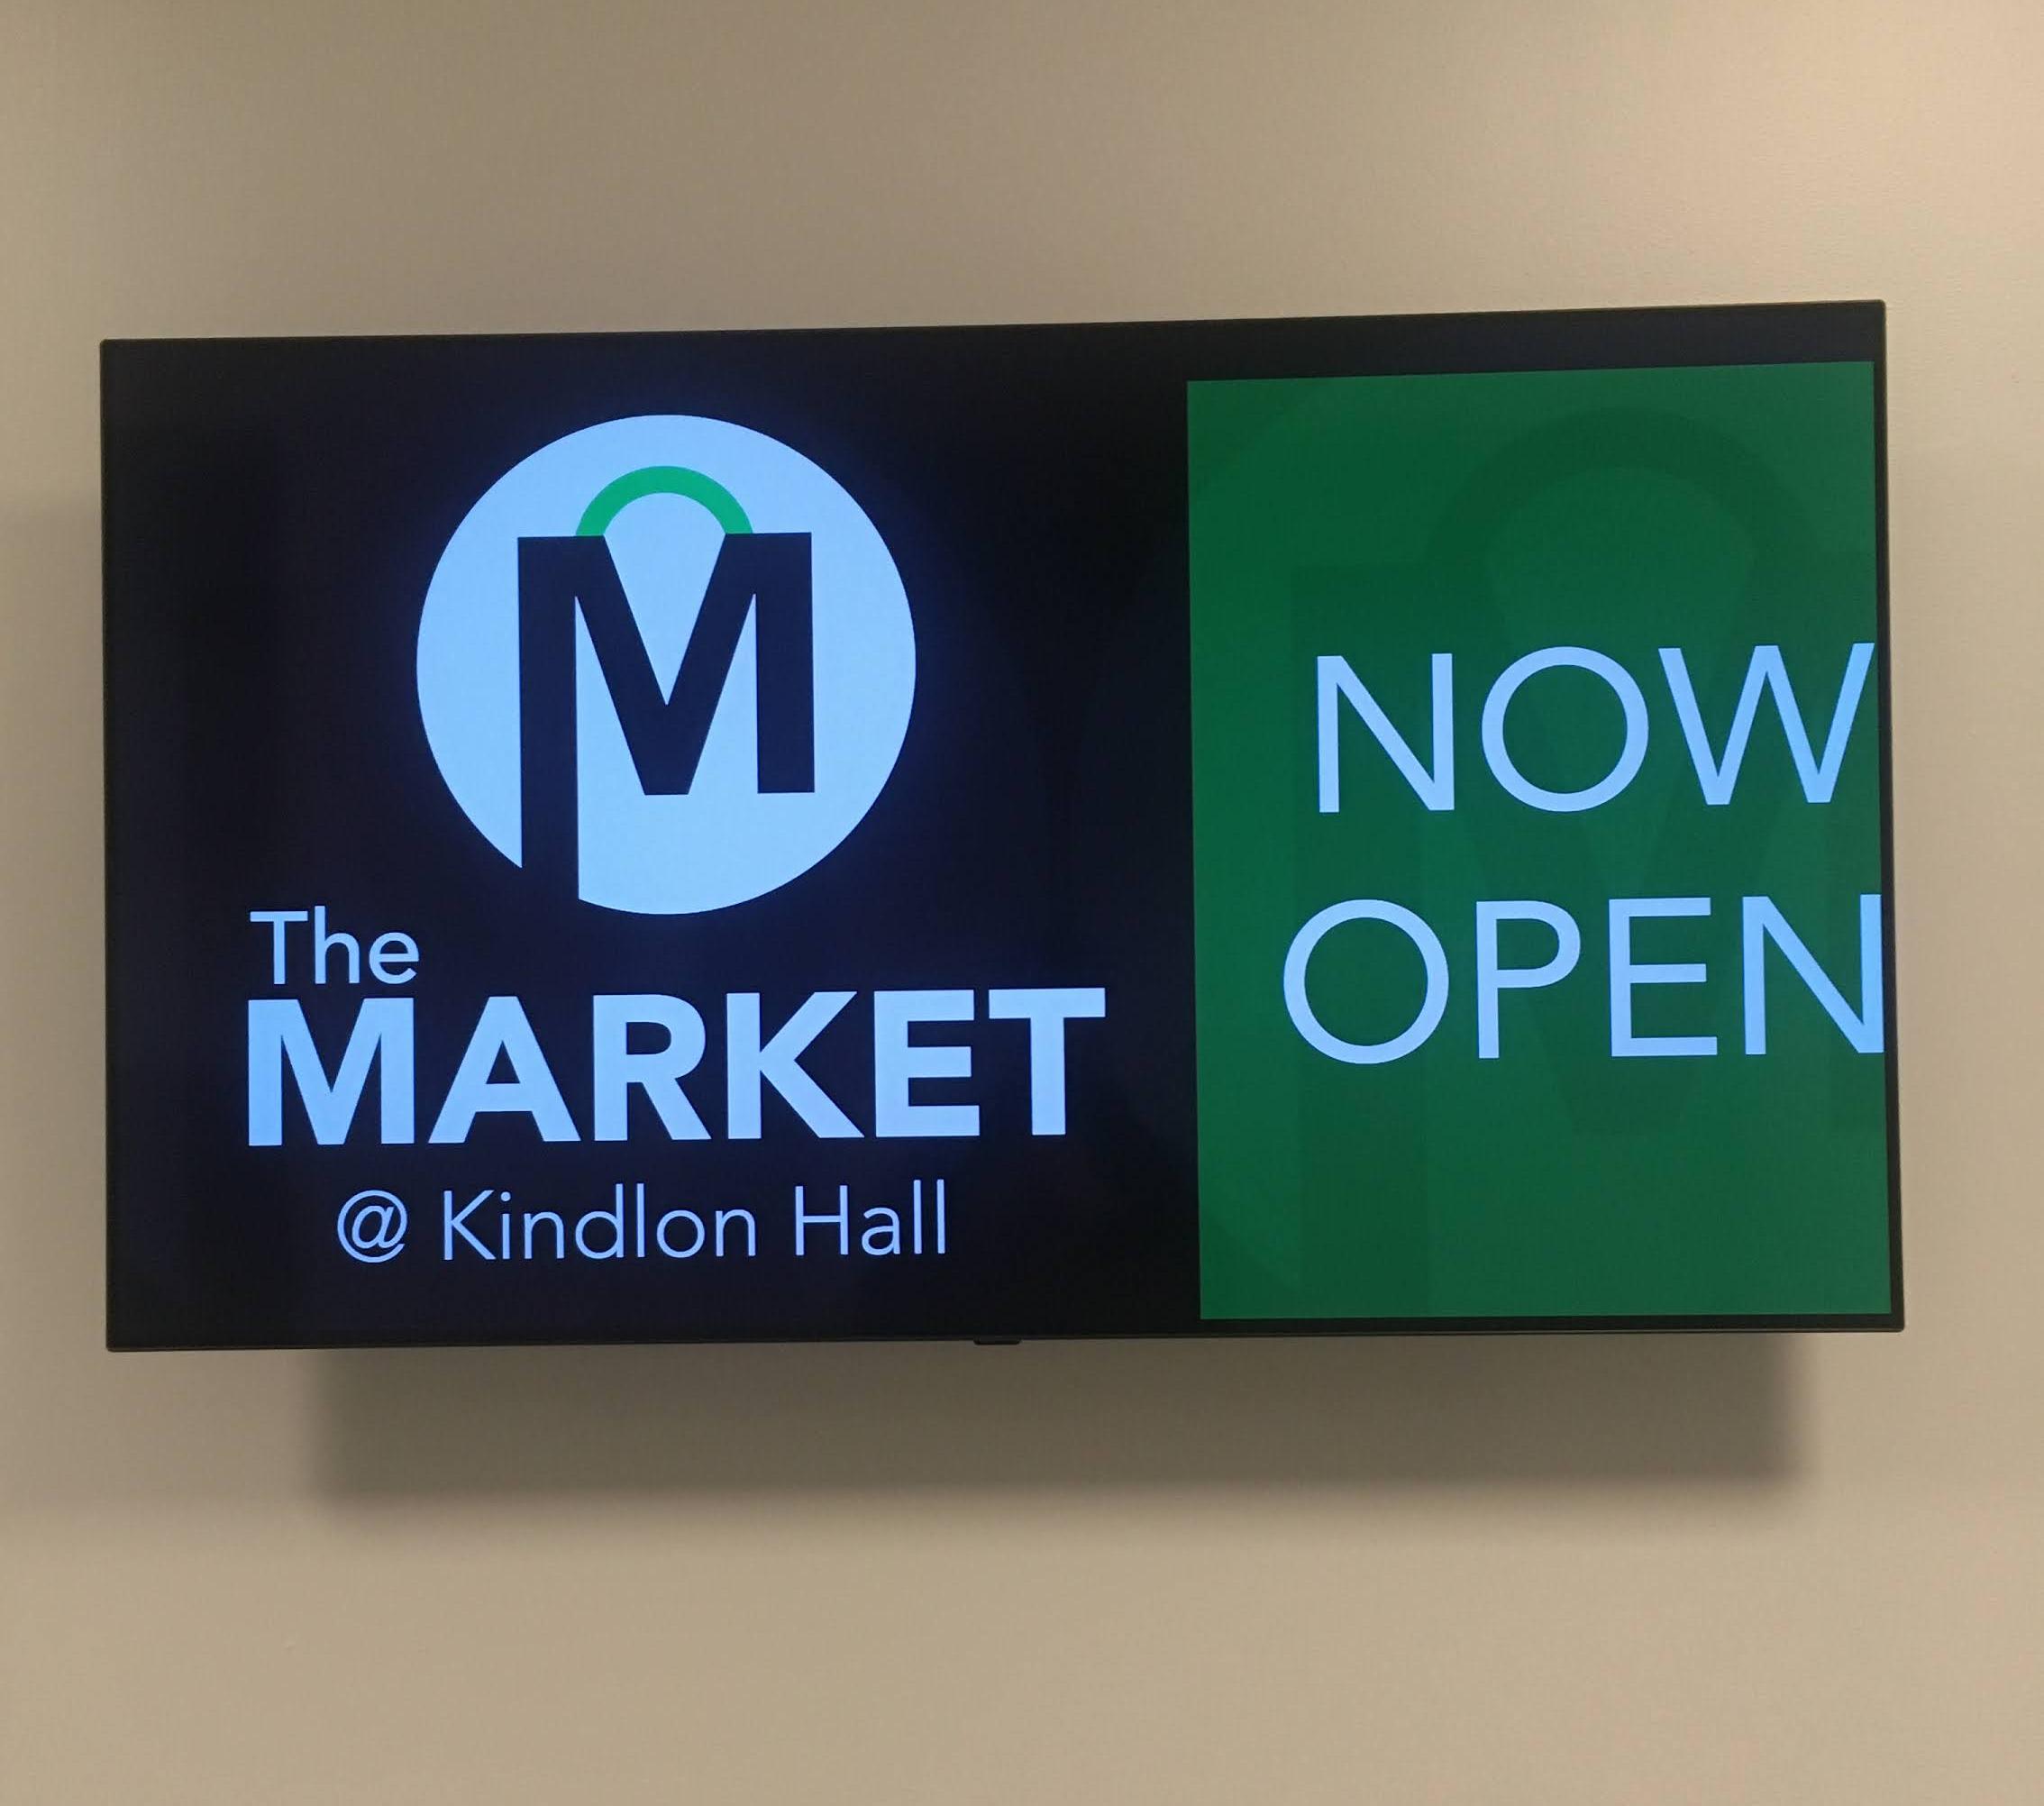 The Market @ Kindlon